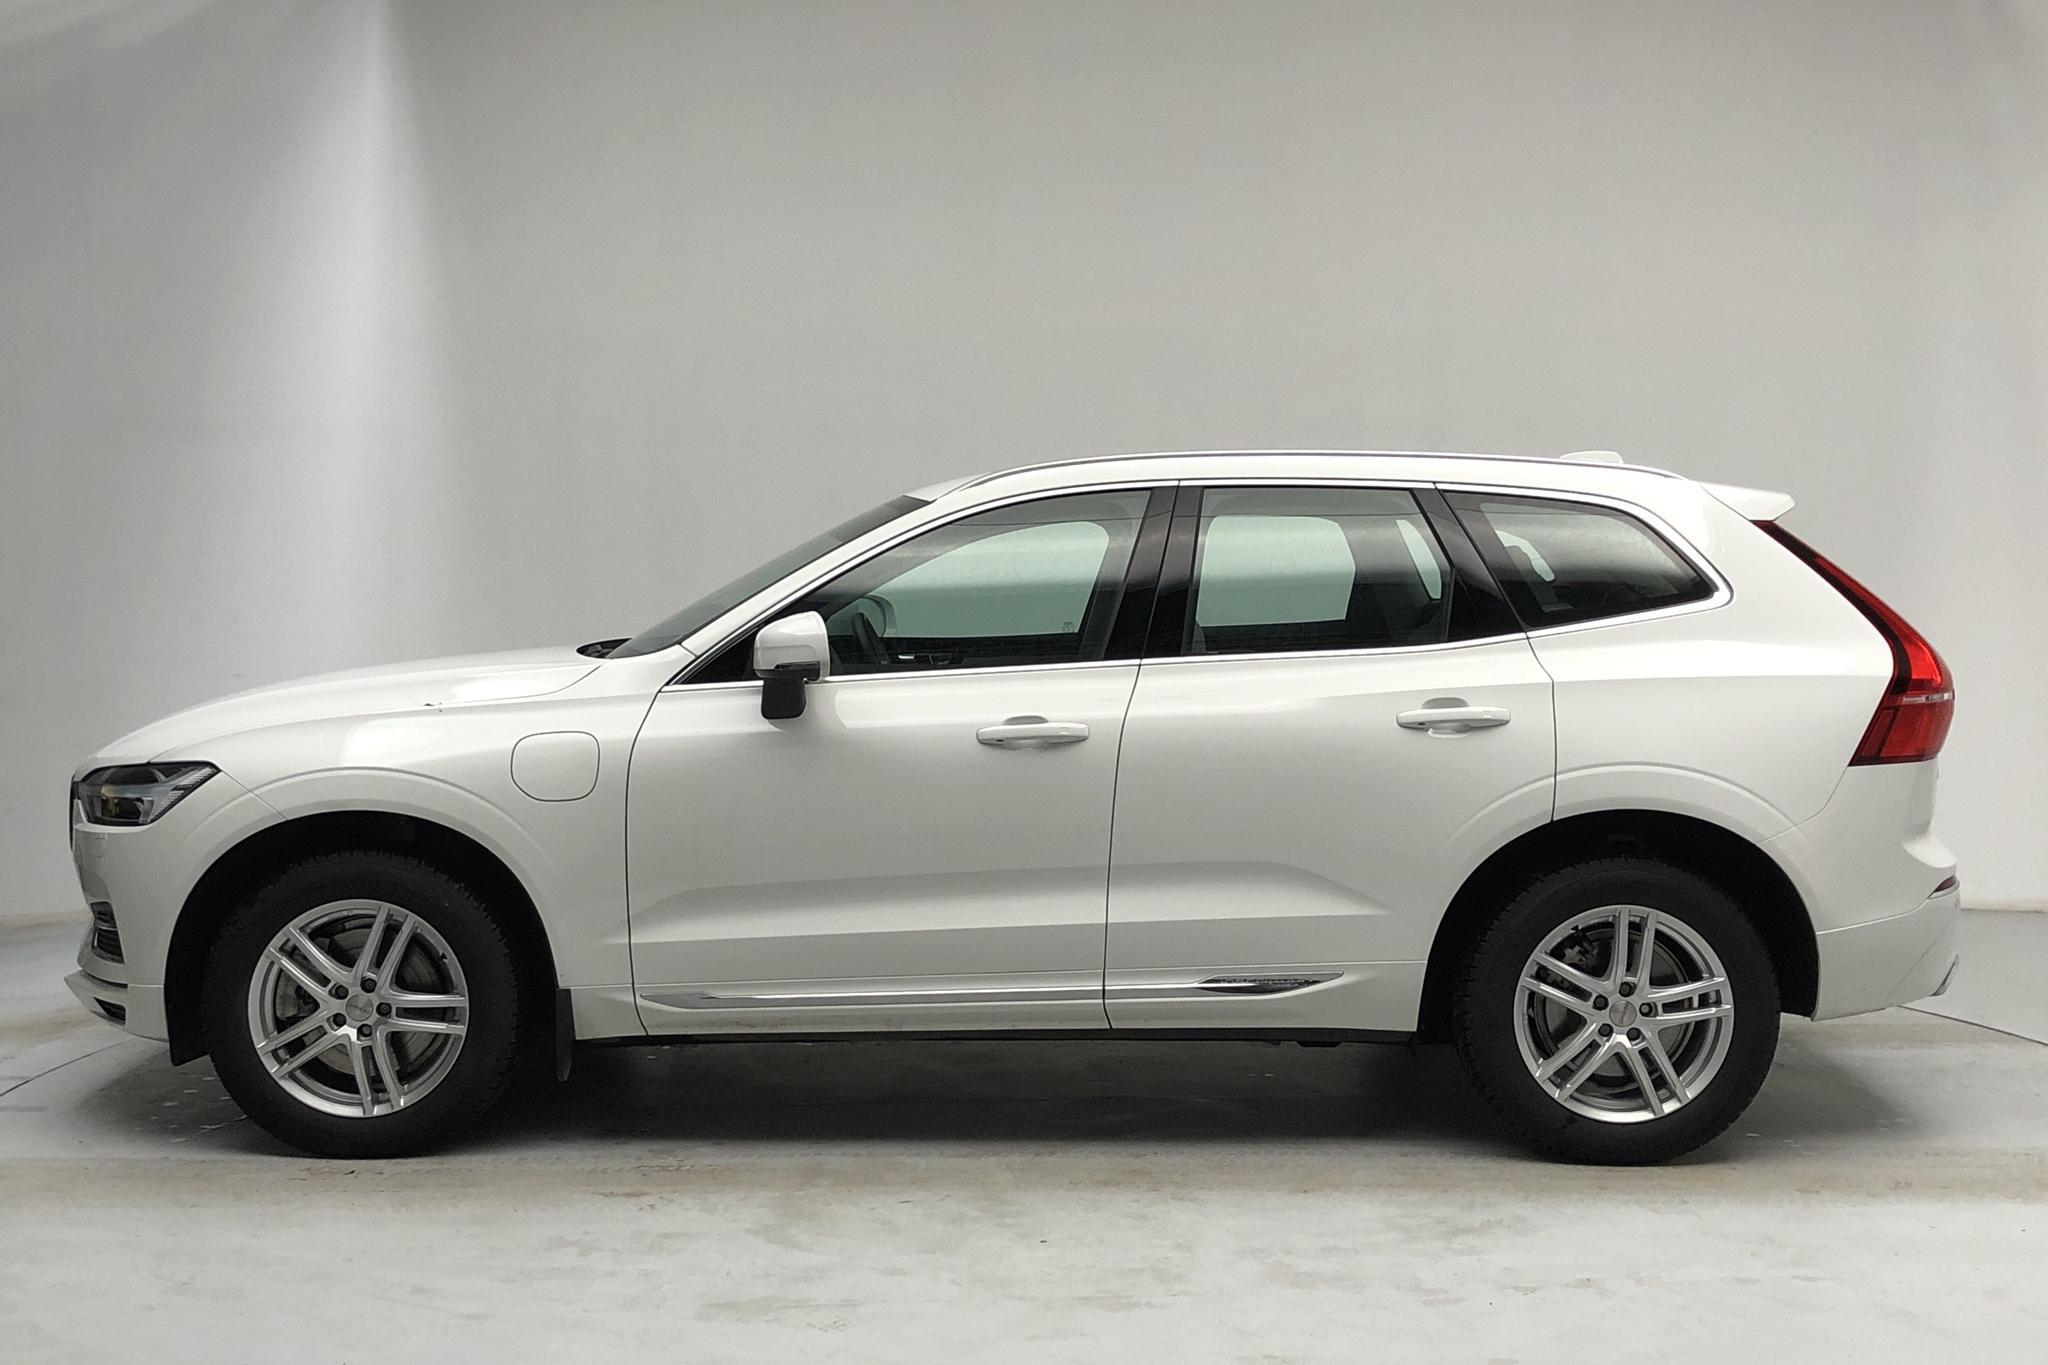 Volvo XC60 T8 AWD Twin Engine (390hk) - 25 360 km - Automatic - white - 2020